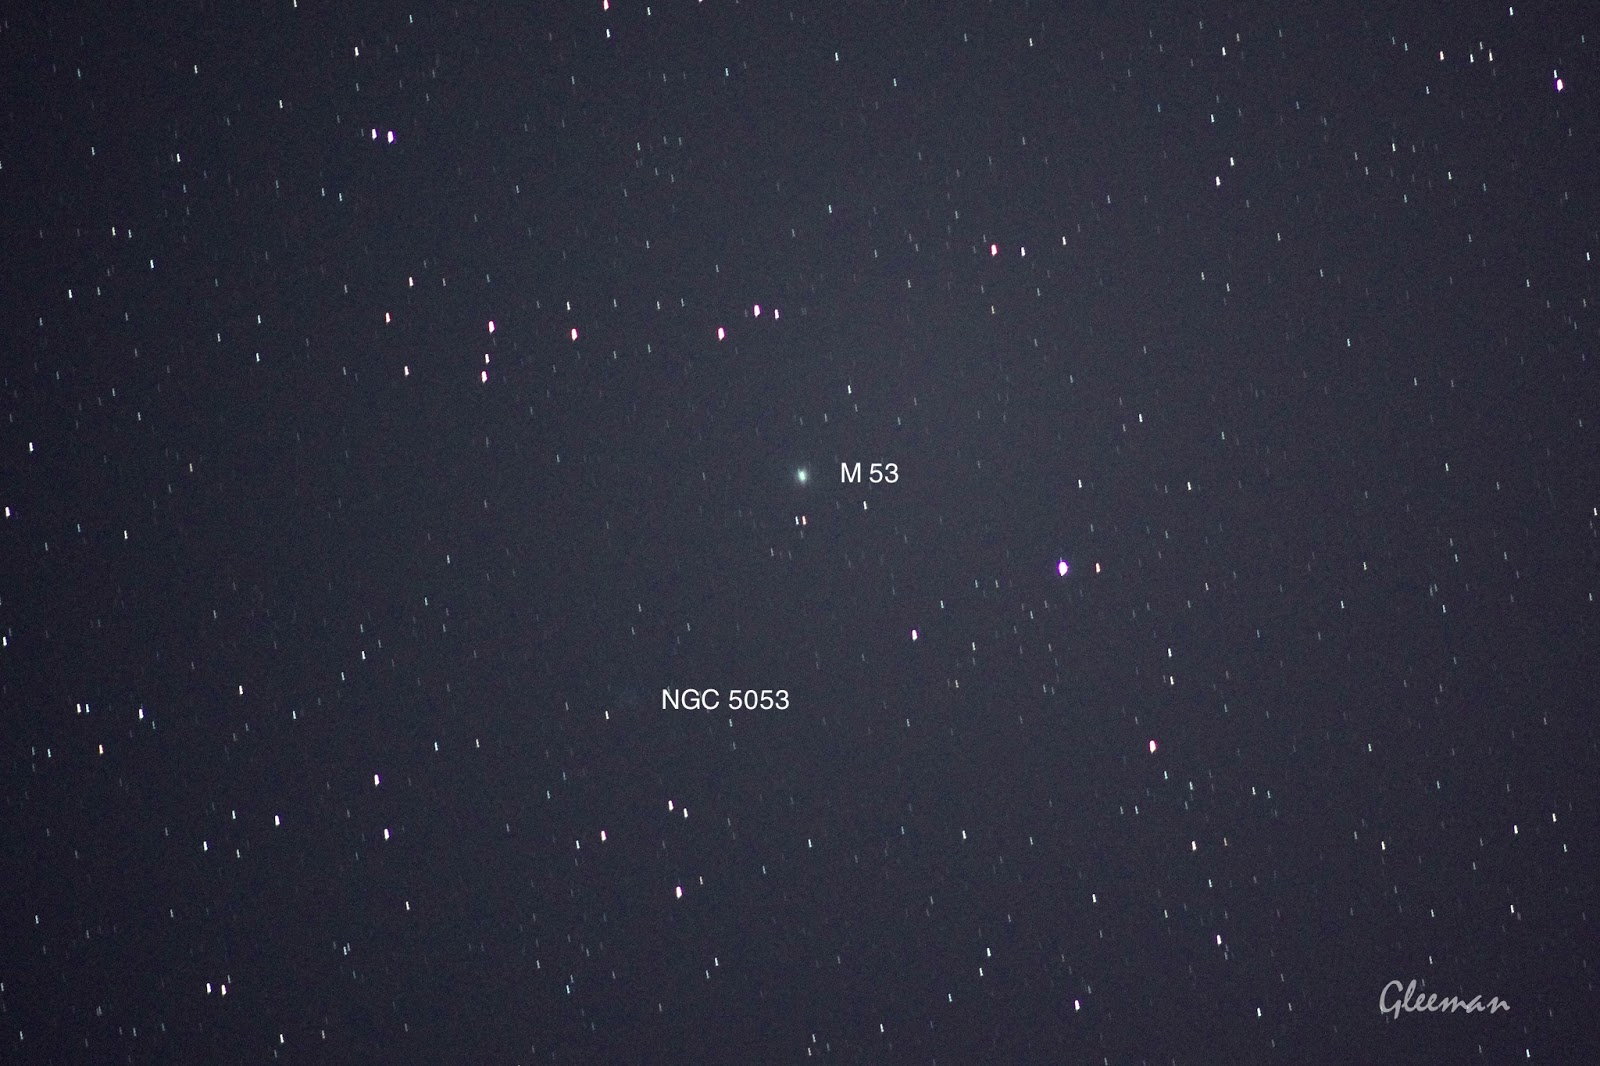 M53, NGC 5053/ Pentax  K5 + Pentax O-GPS1 + DA*200